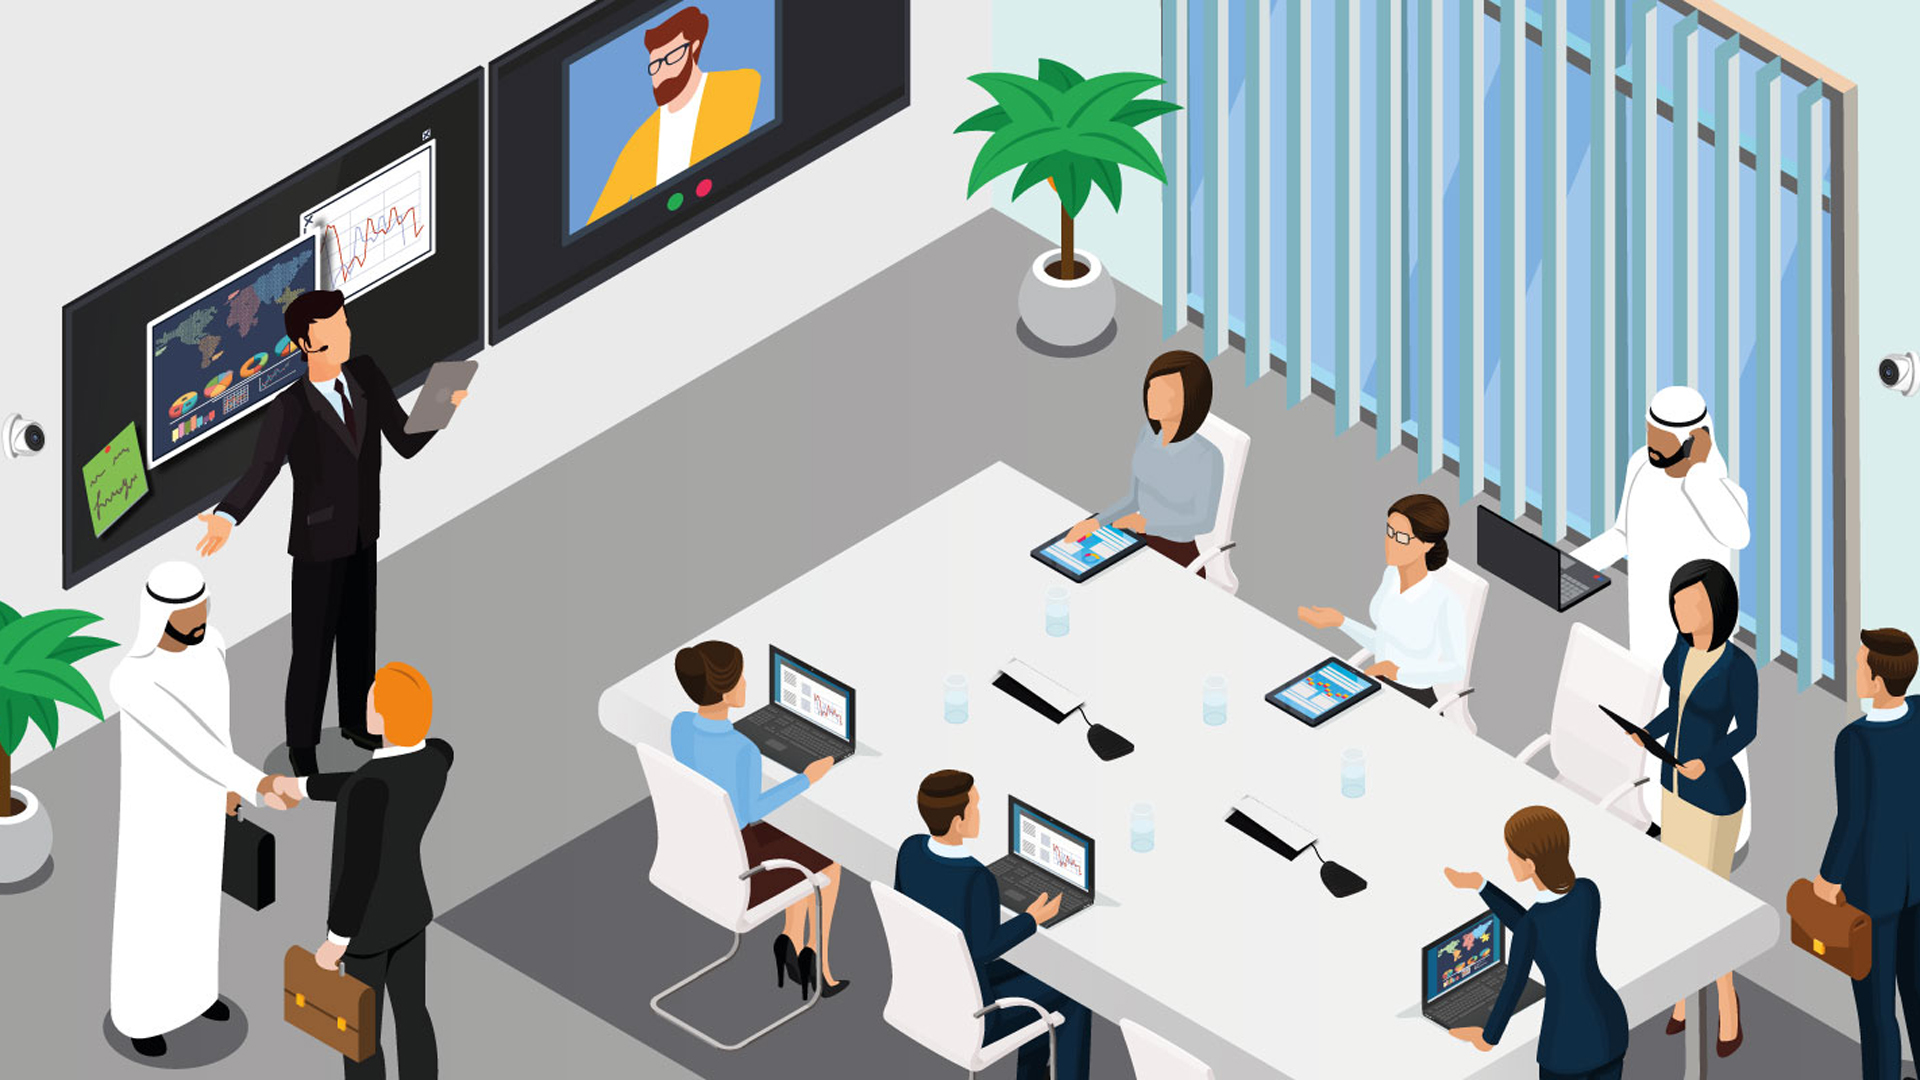 nuove-sale-riunioni-videoconference-touchwindow-Level-Office-Landscape